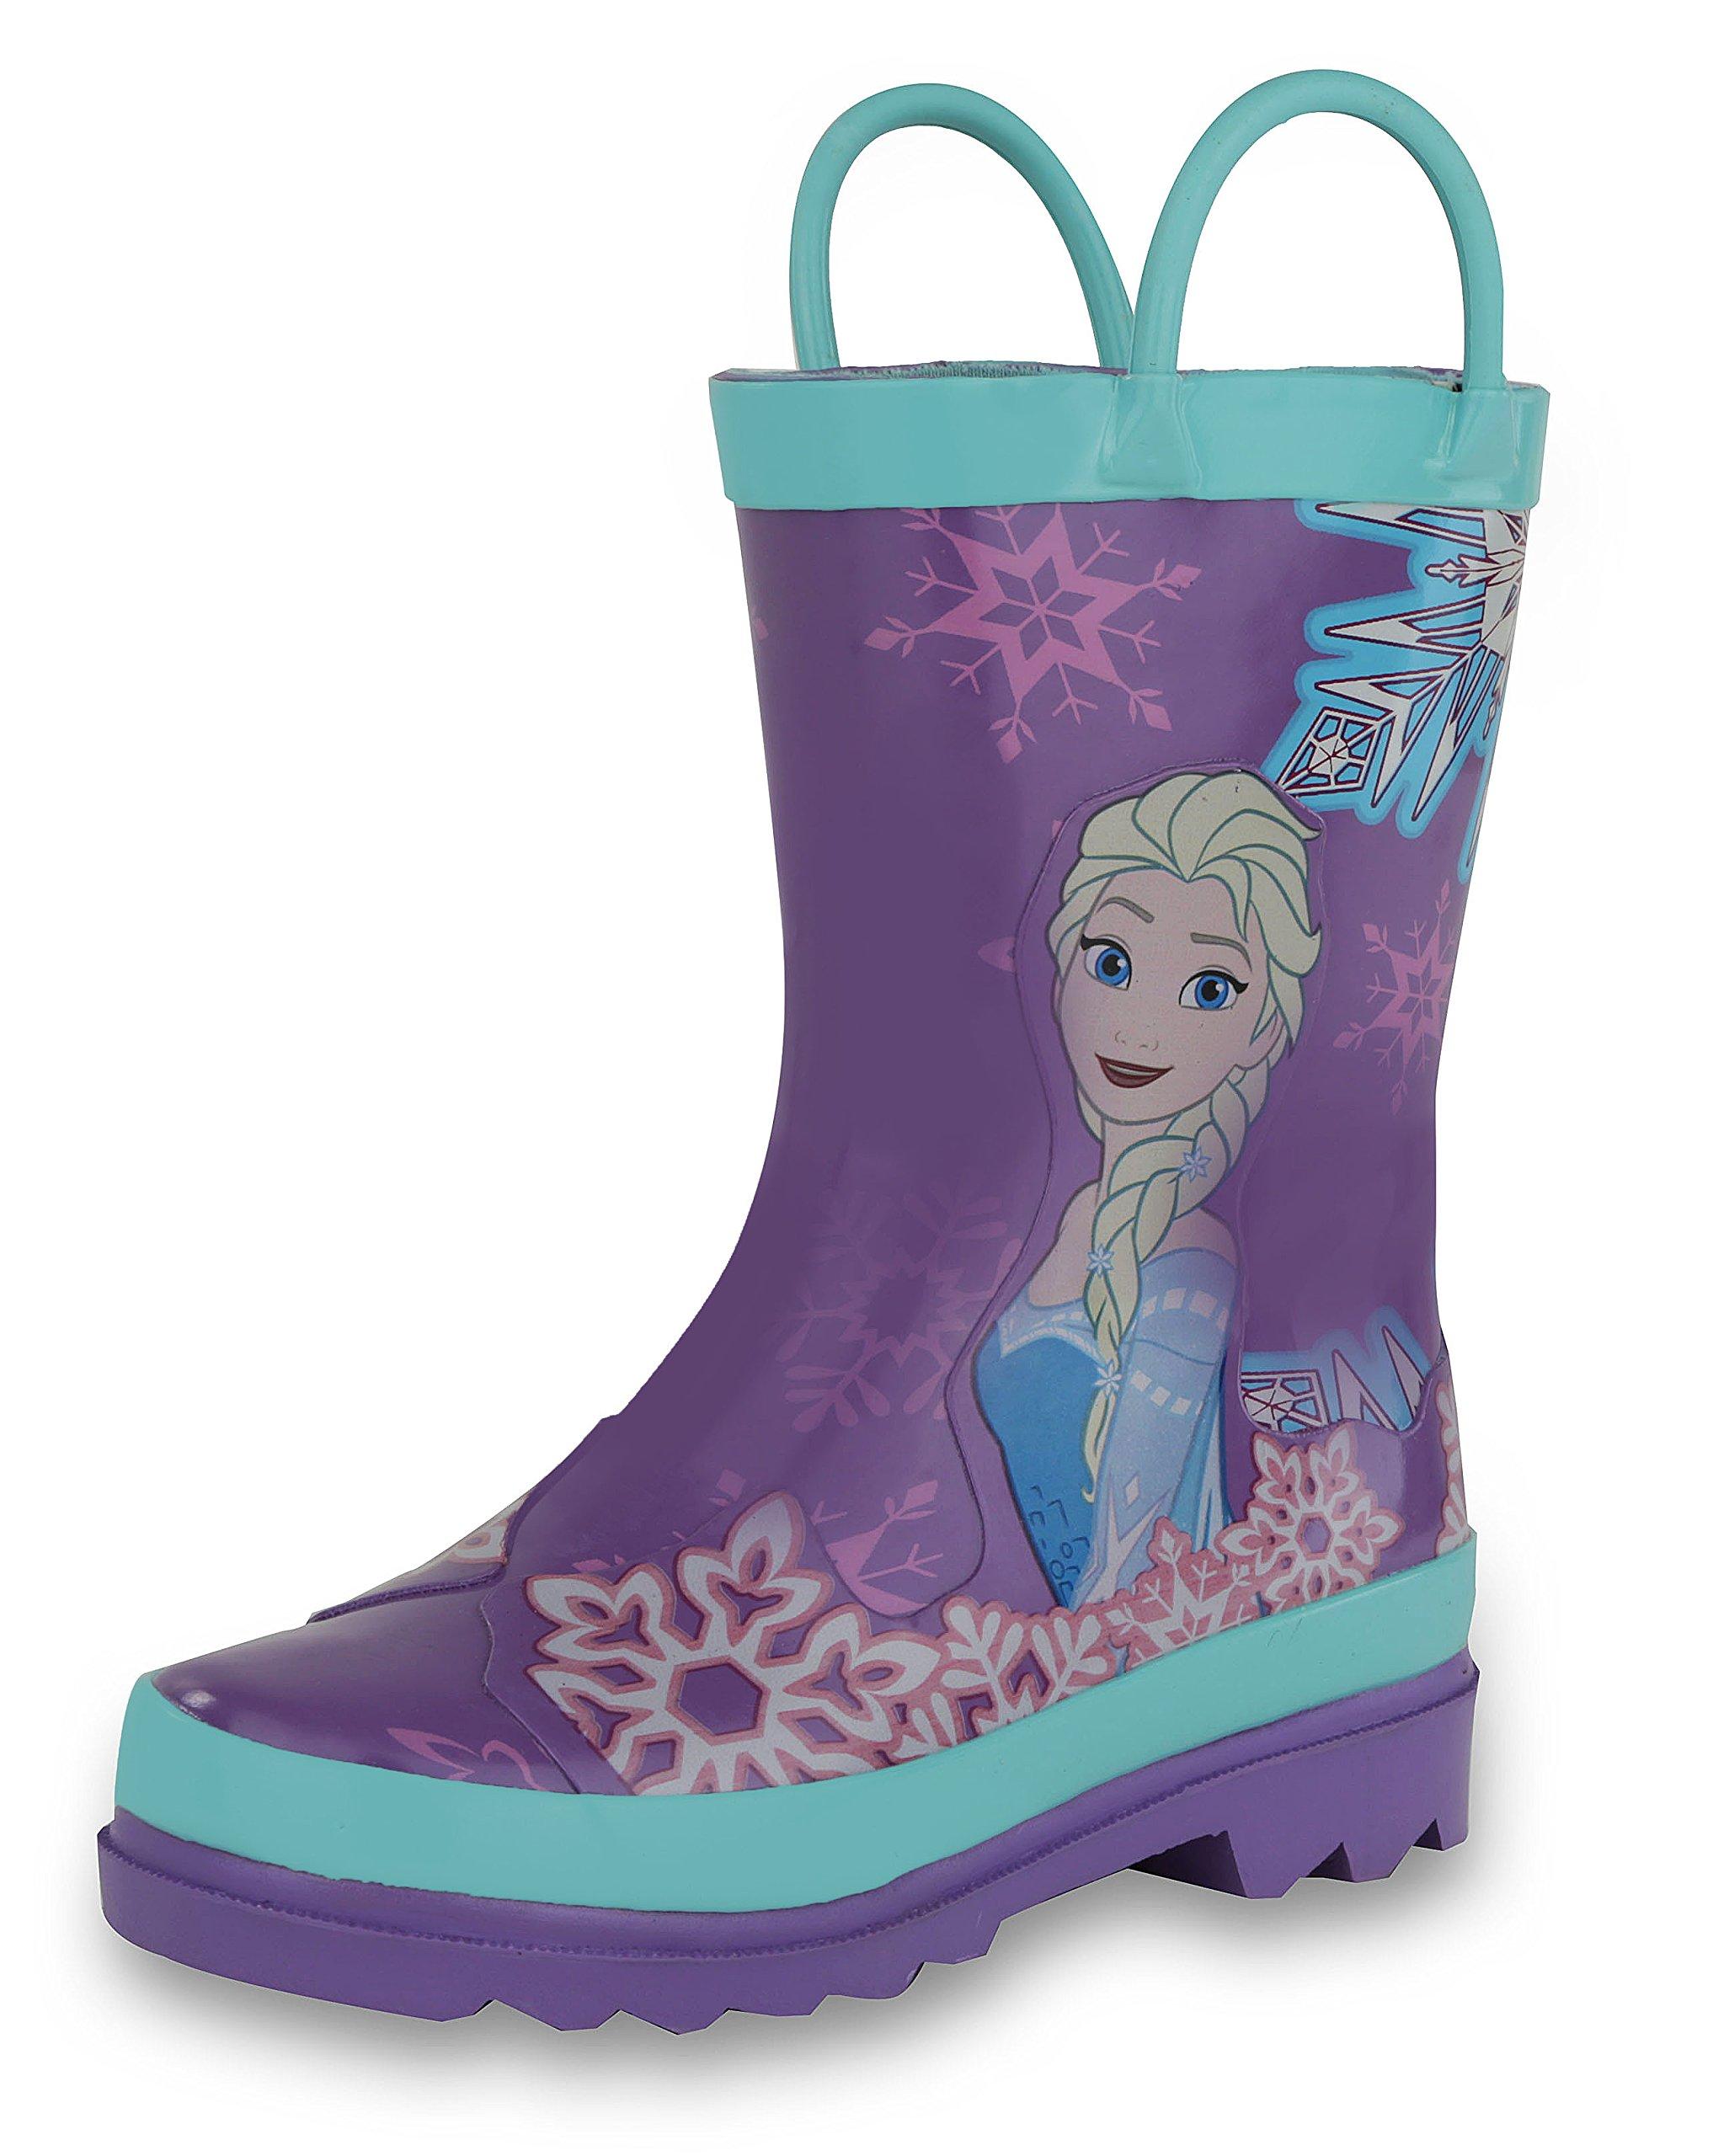 Disney Frozen Girls Anna and Elsa Pink Rain Boots - Size 1 Little Kid